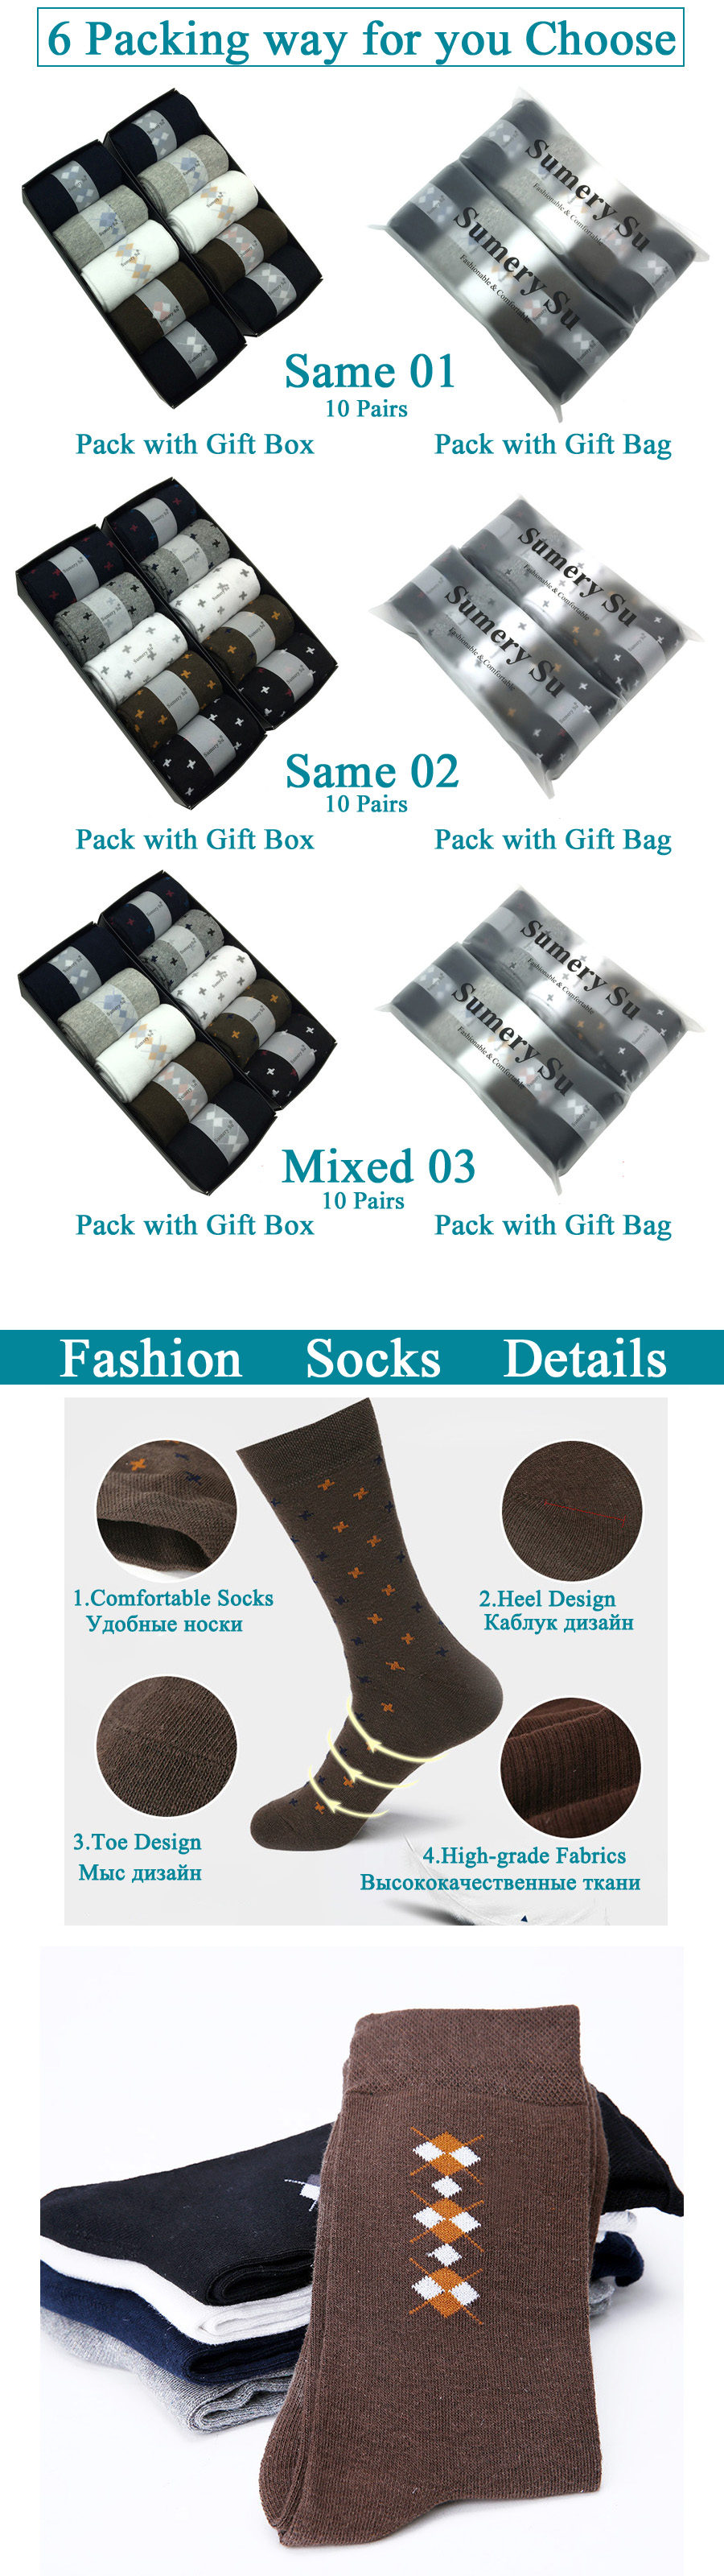 Socks details display03